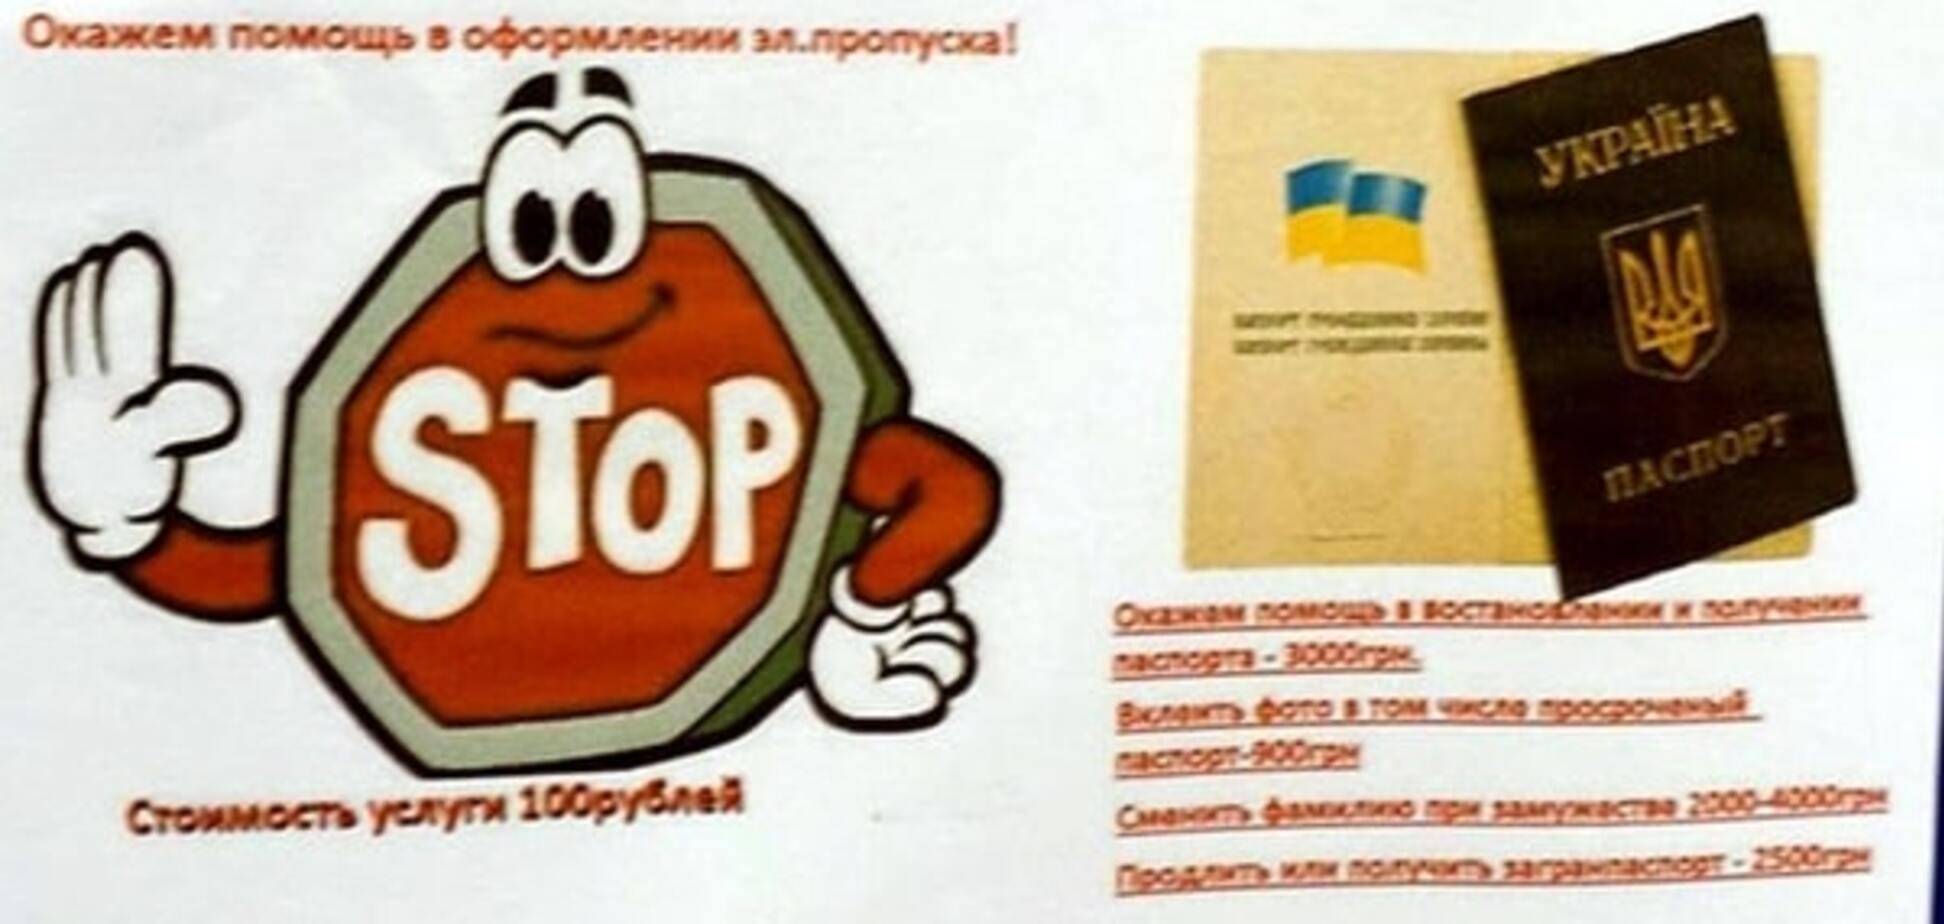 Паспорт и пенсия 'под ключ': на Донбассе делают бизнес на документах Украины